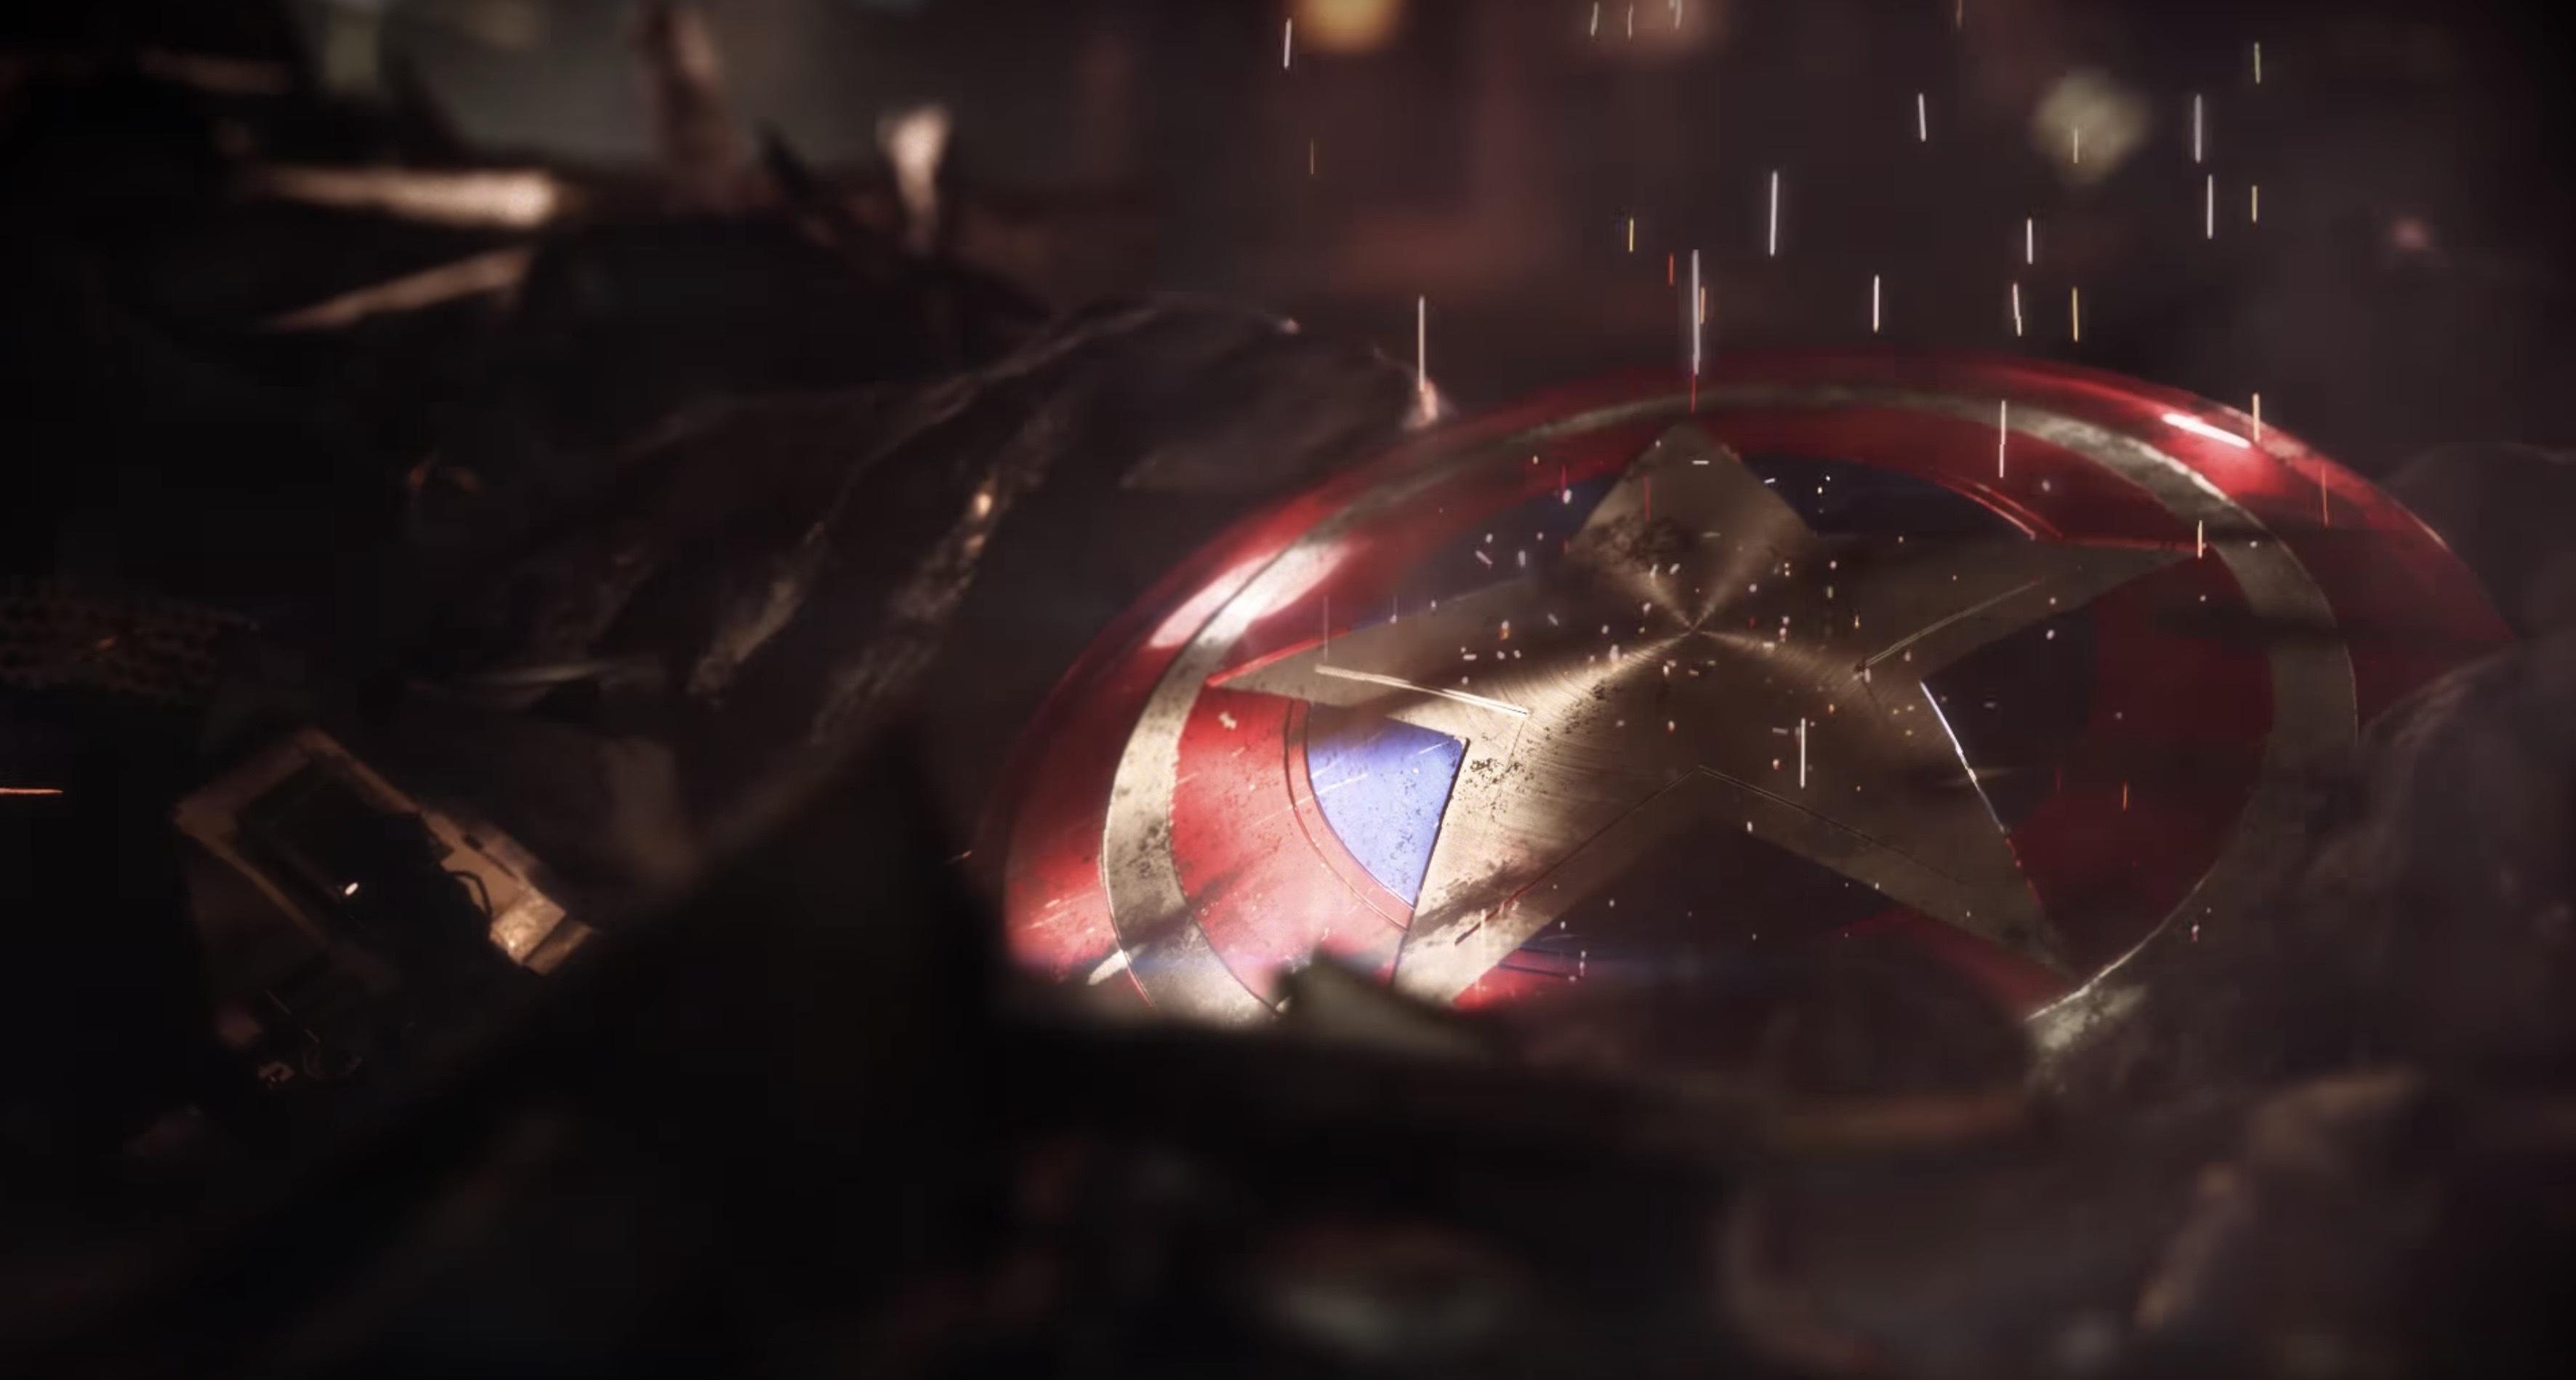 Captain America Shield 4k, HD Movies, 4k Wallpapers